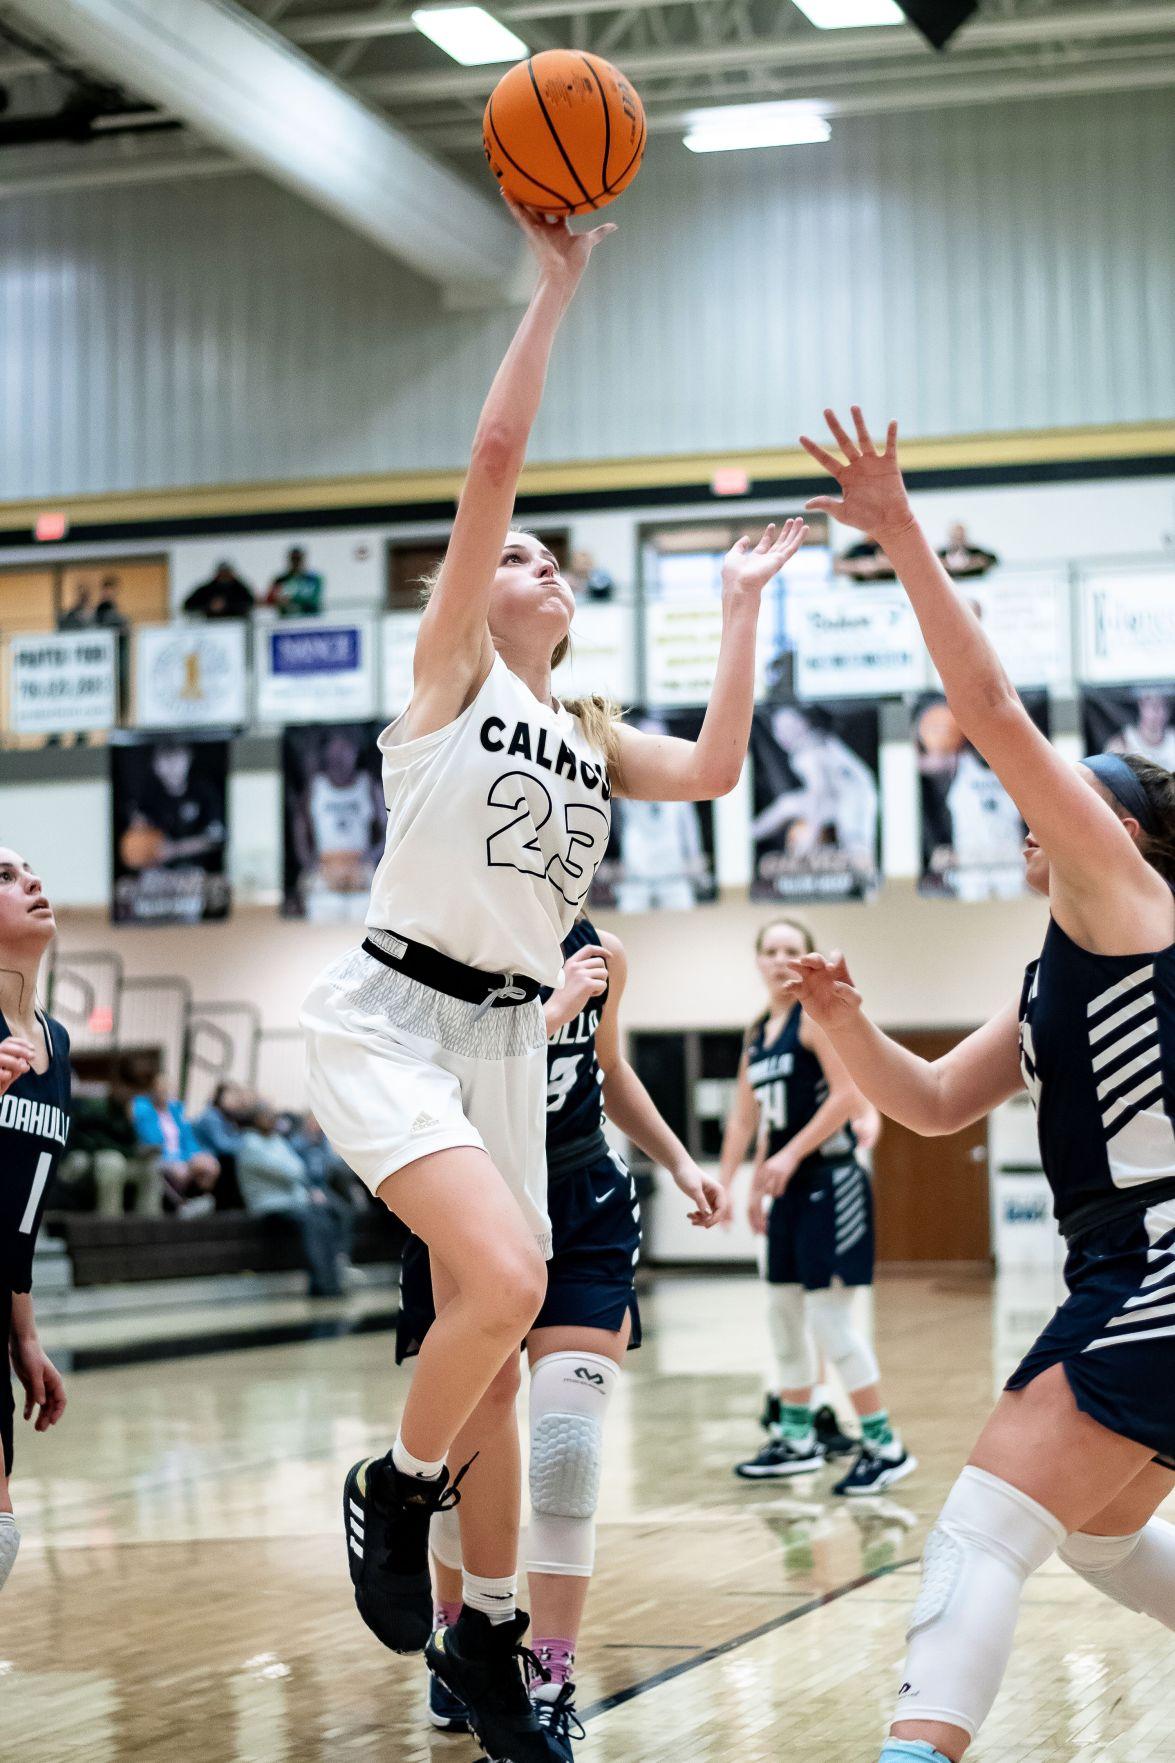 Calhoun Basketball - Anna George vs. Coahulla Creek